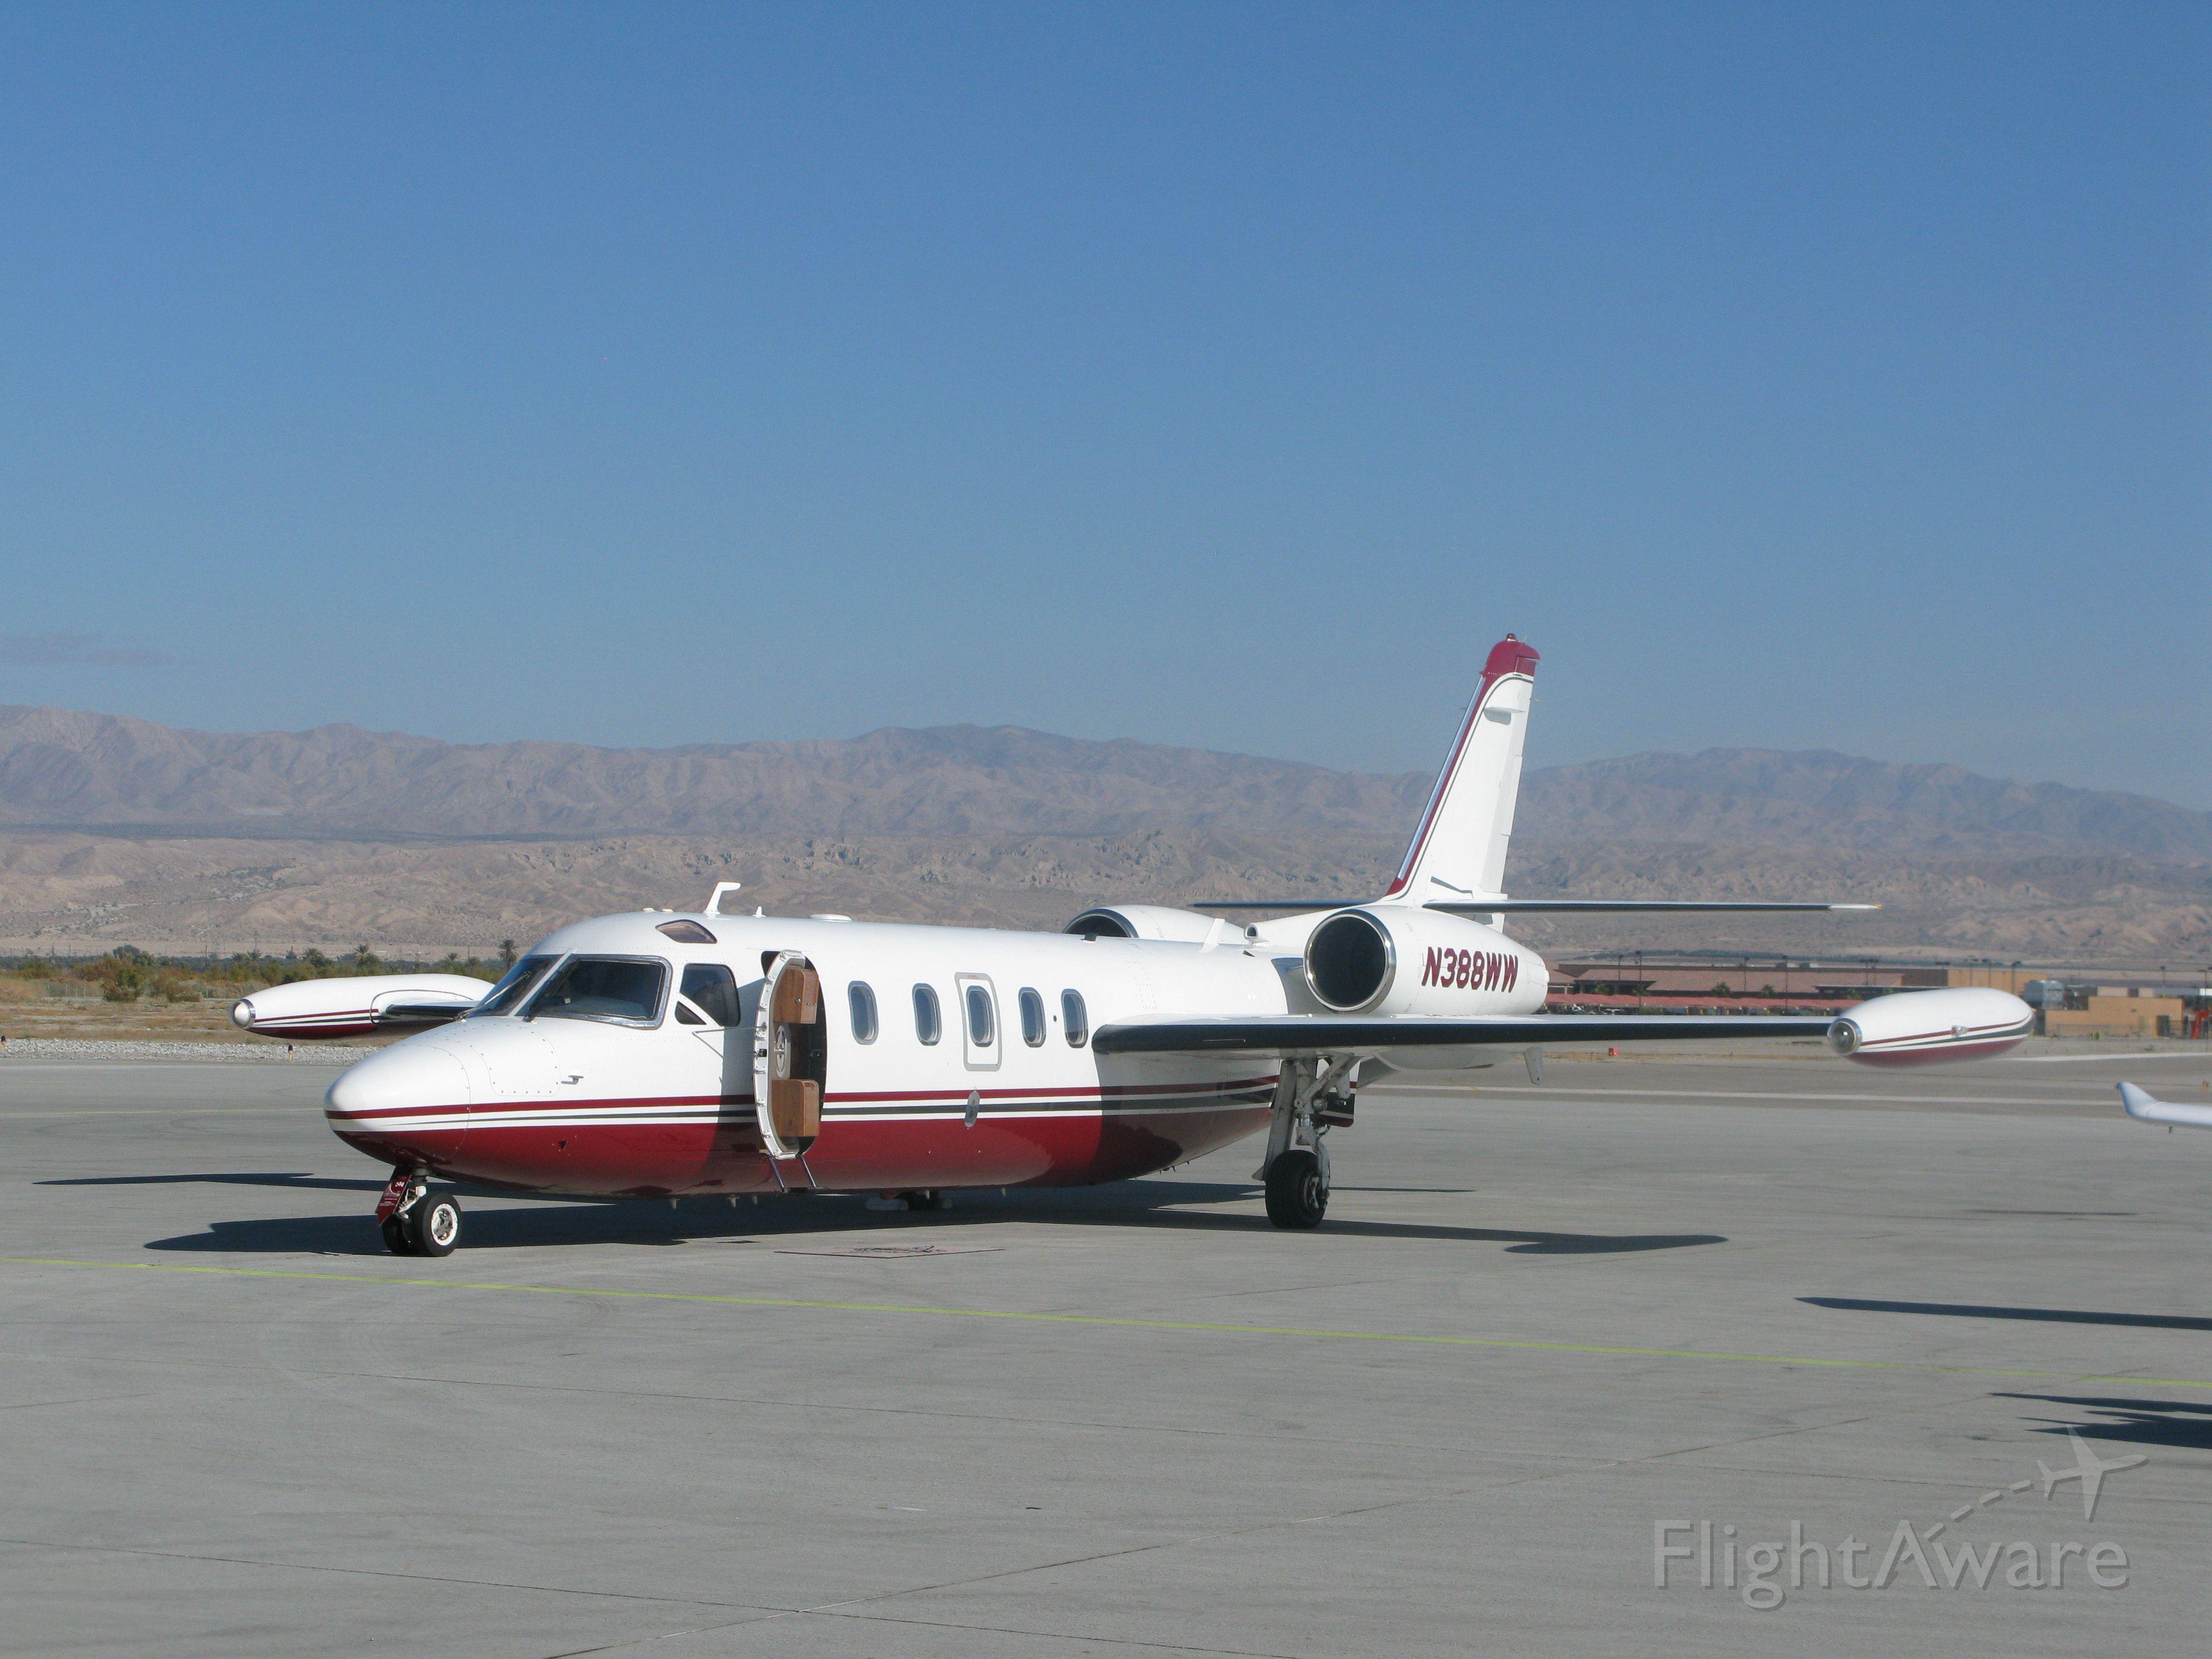 N388WW — - ISRAEL AIRCRAFT INDUSTRIES Model 1124 at Jacqueline Cochran (Thermal), CA